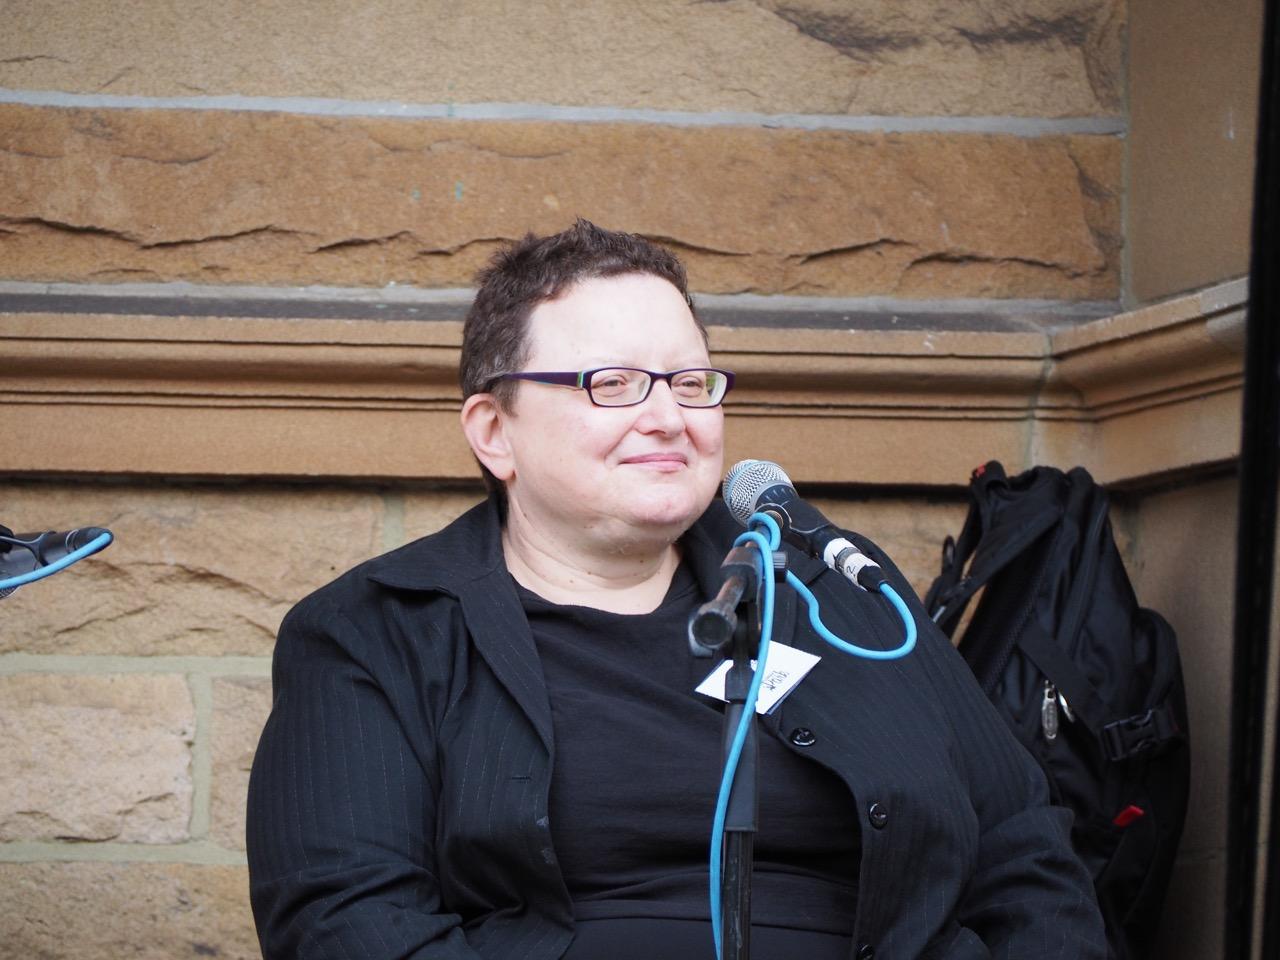 Maria Katsonis, author of The Good Greek Girl. Photo by John Grant.